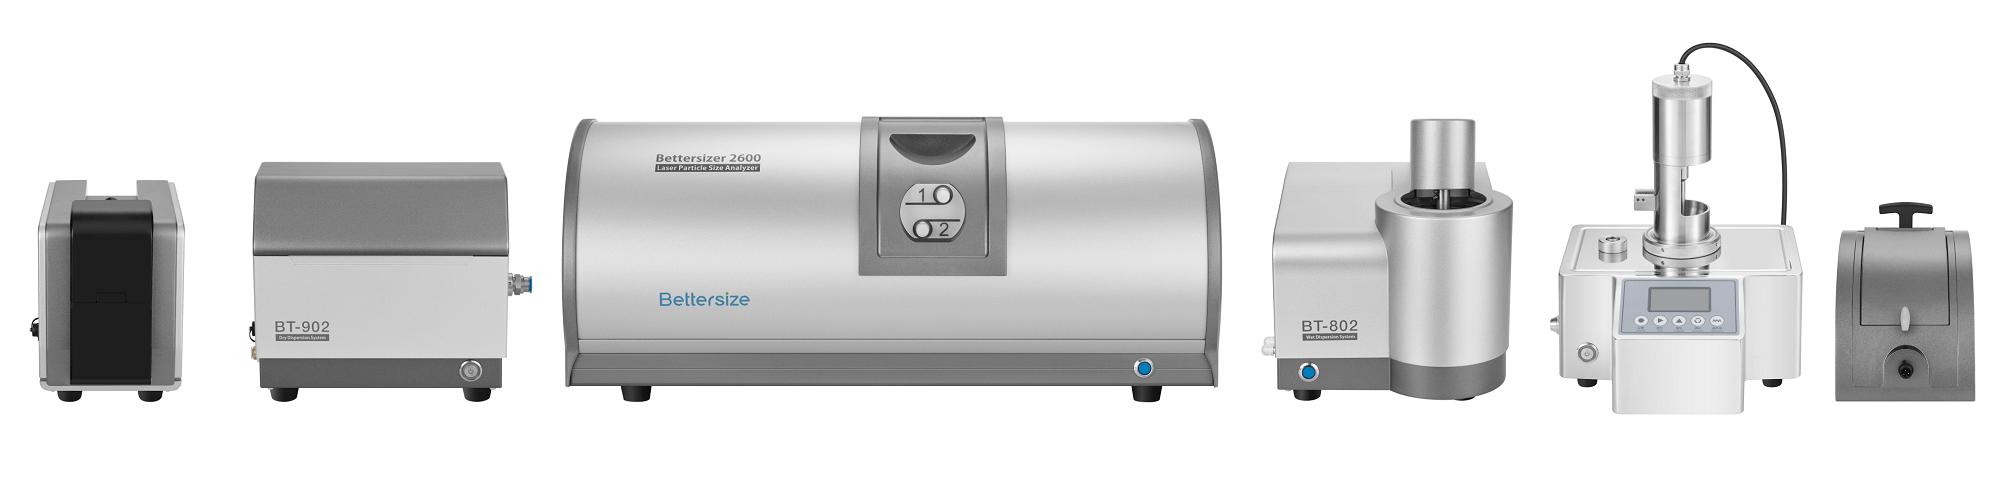 A Laser Particle Size Analyzer — Bettersizer 2600